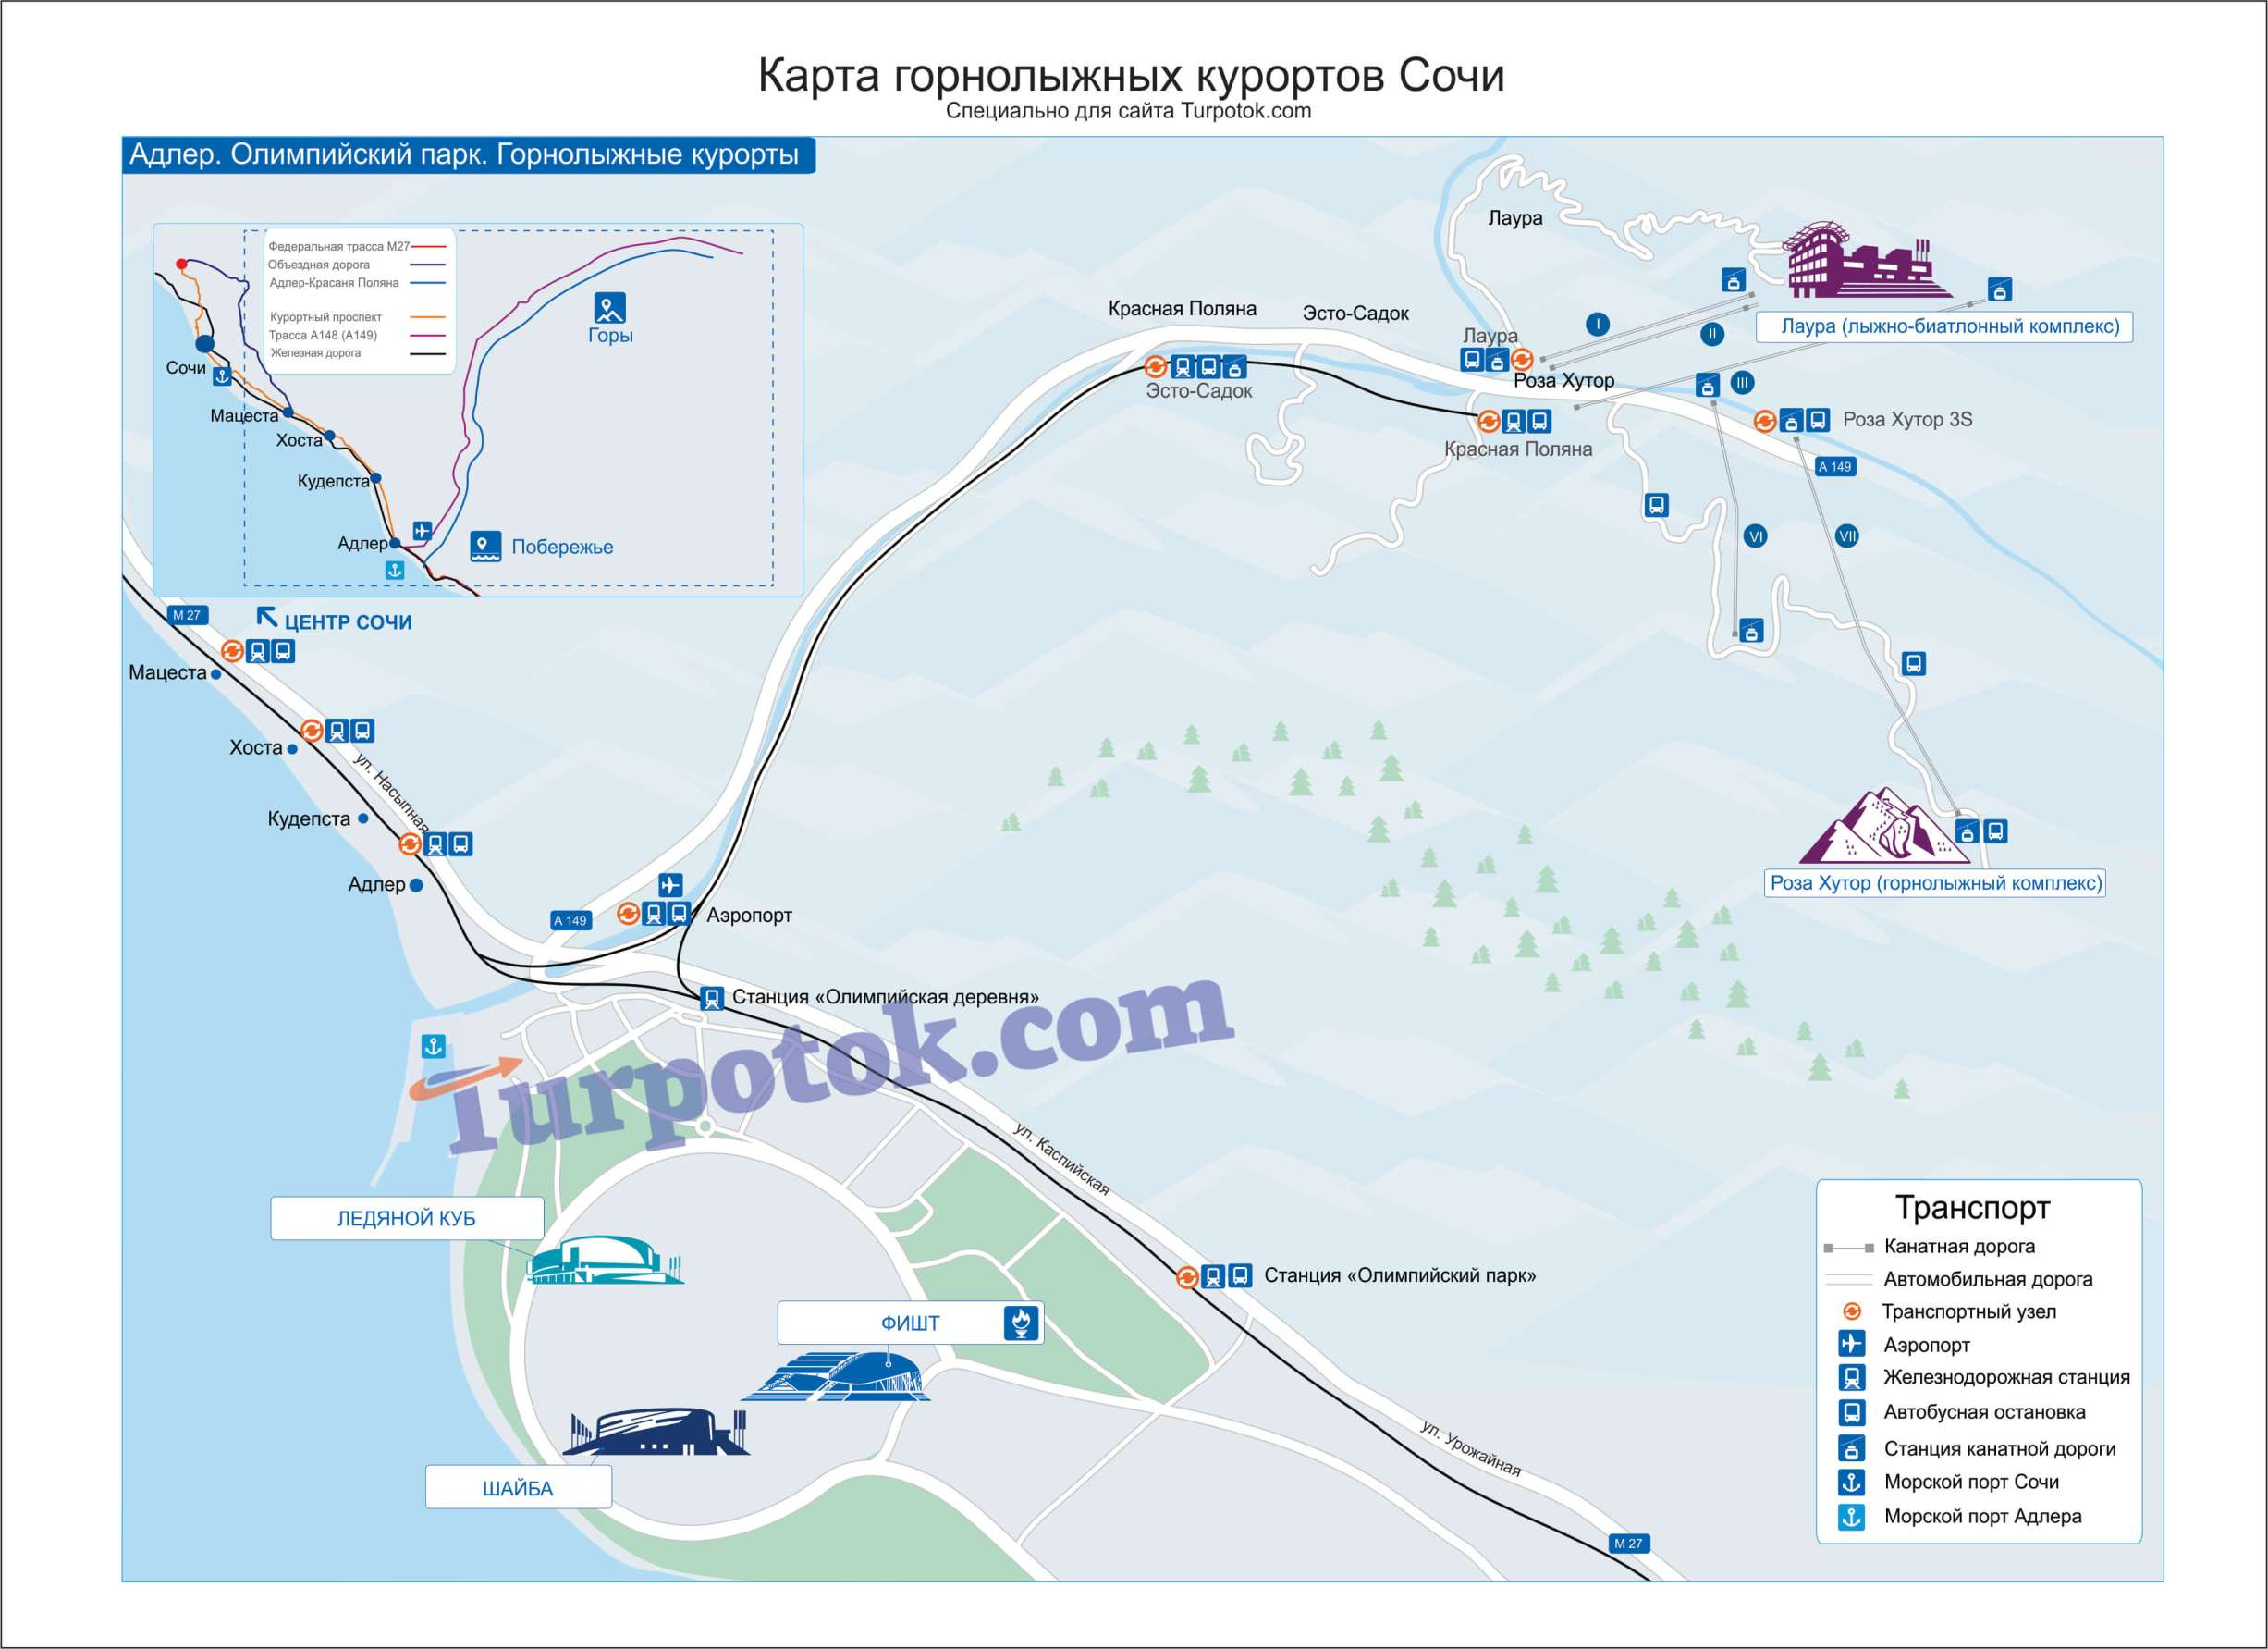 Карта курортов: Красная Поляна, Эсто-Садок, Лаура, Роза Хутор